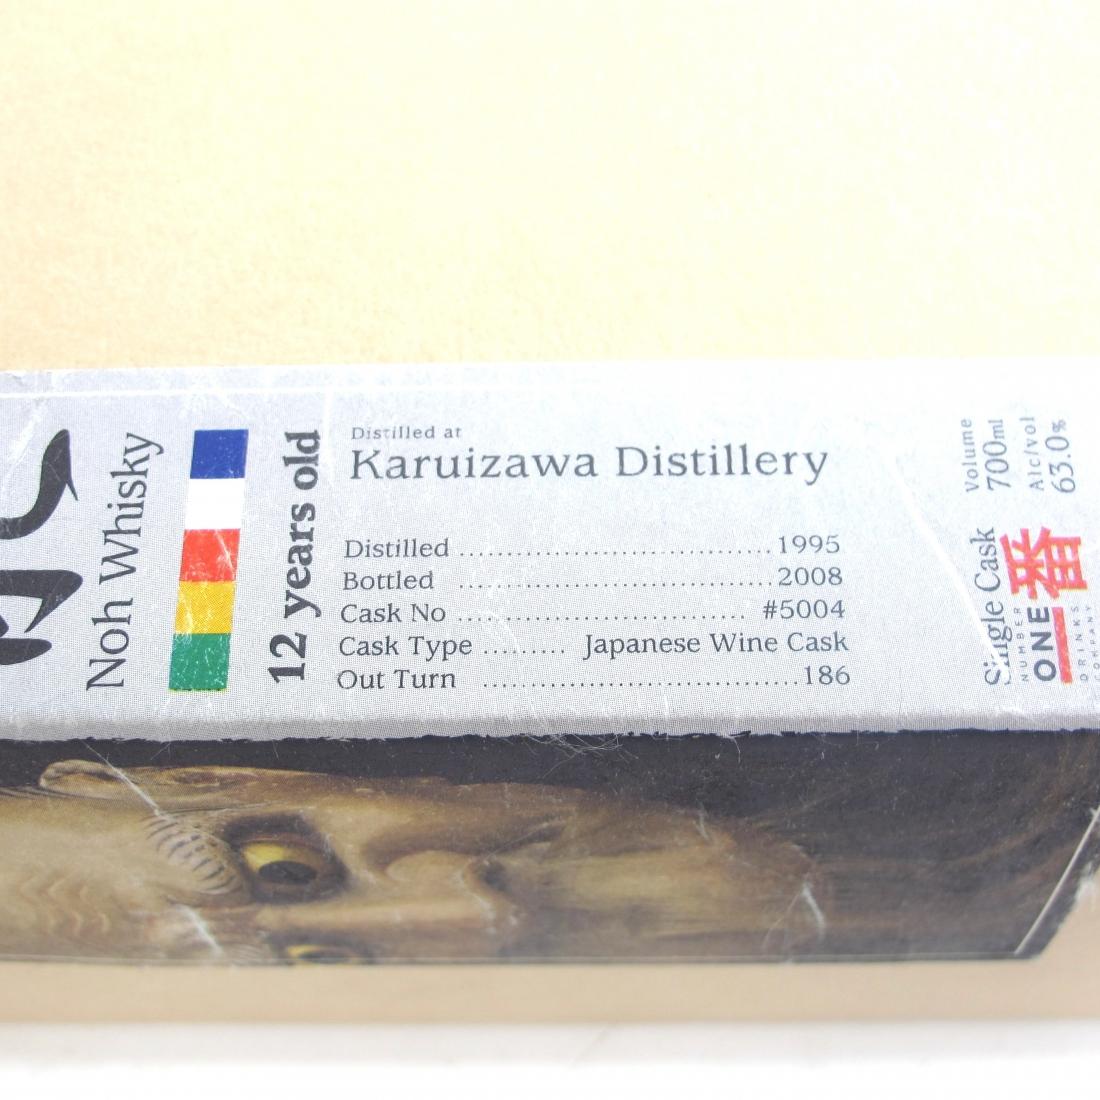 Karuizawa 1995 Noh Single Cask 12 Year Old #5004 / Kamiasobi Exclusive